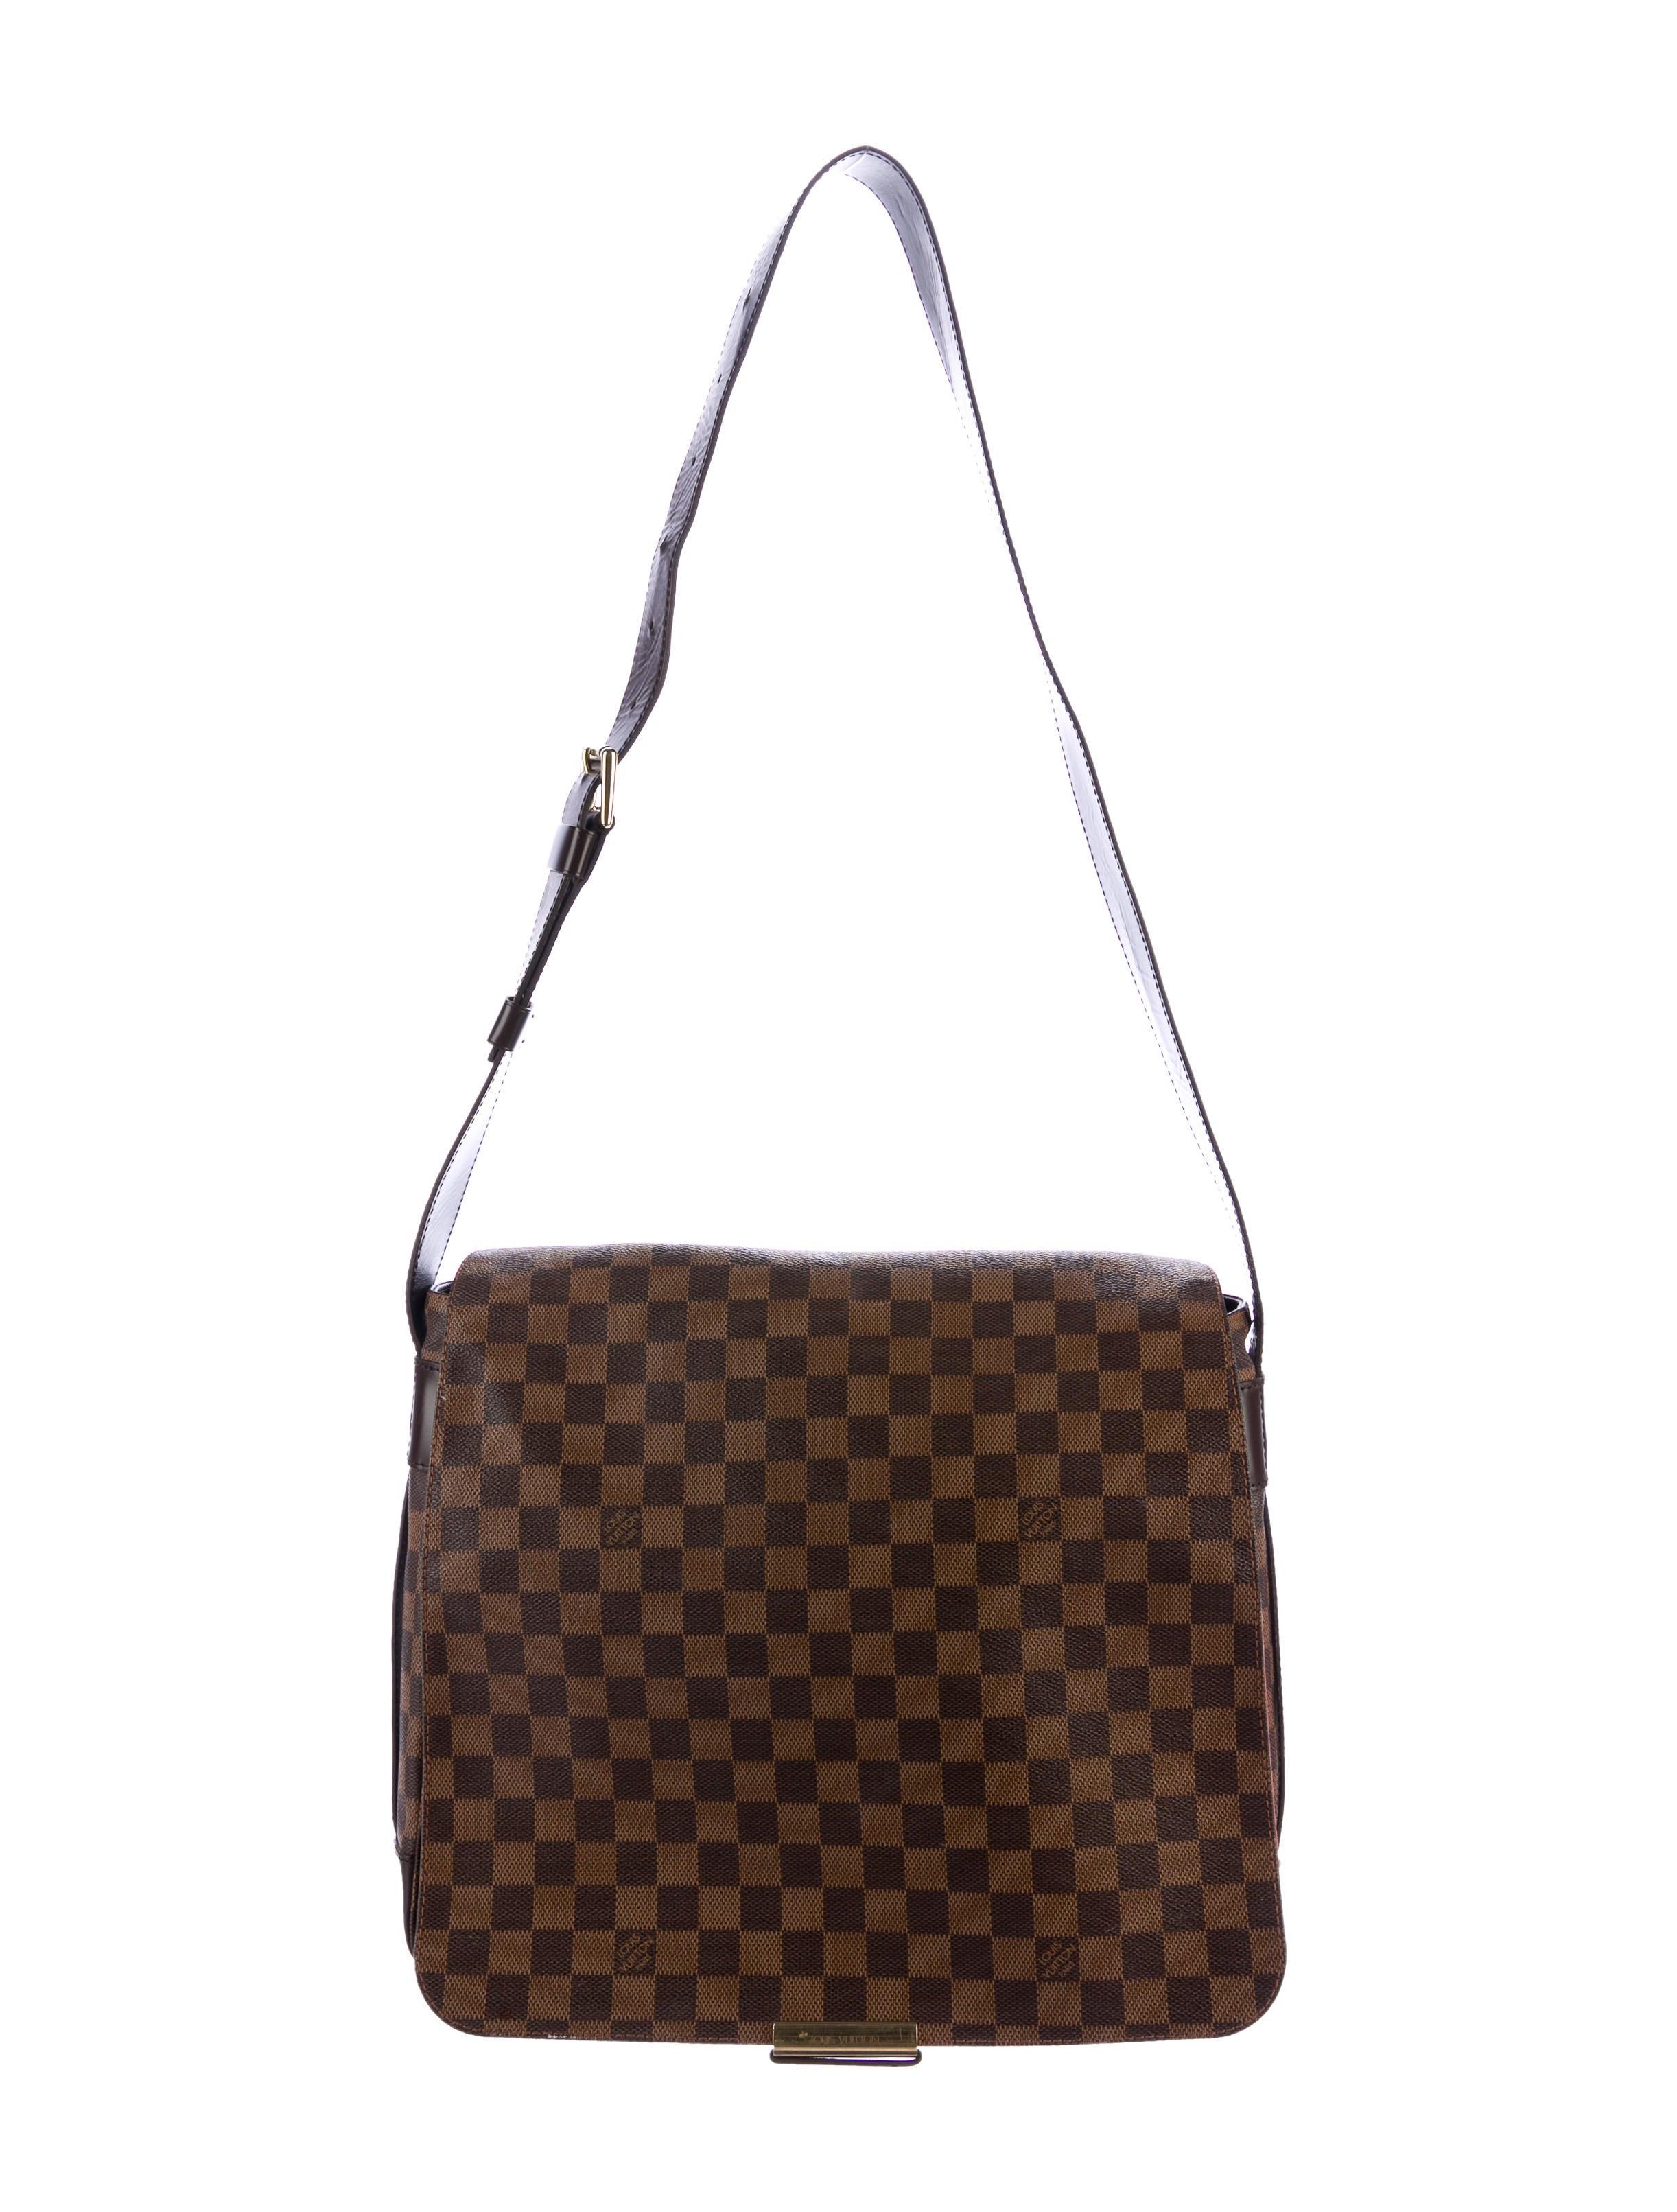 59ea44f8b3da Louis Vuitton Damier Ebene Abbesses Messenger Bag - Bags - LOU126706 ...